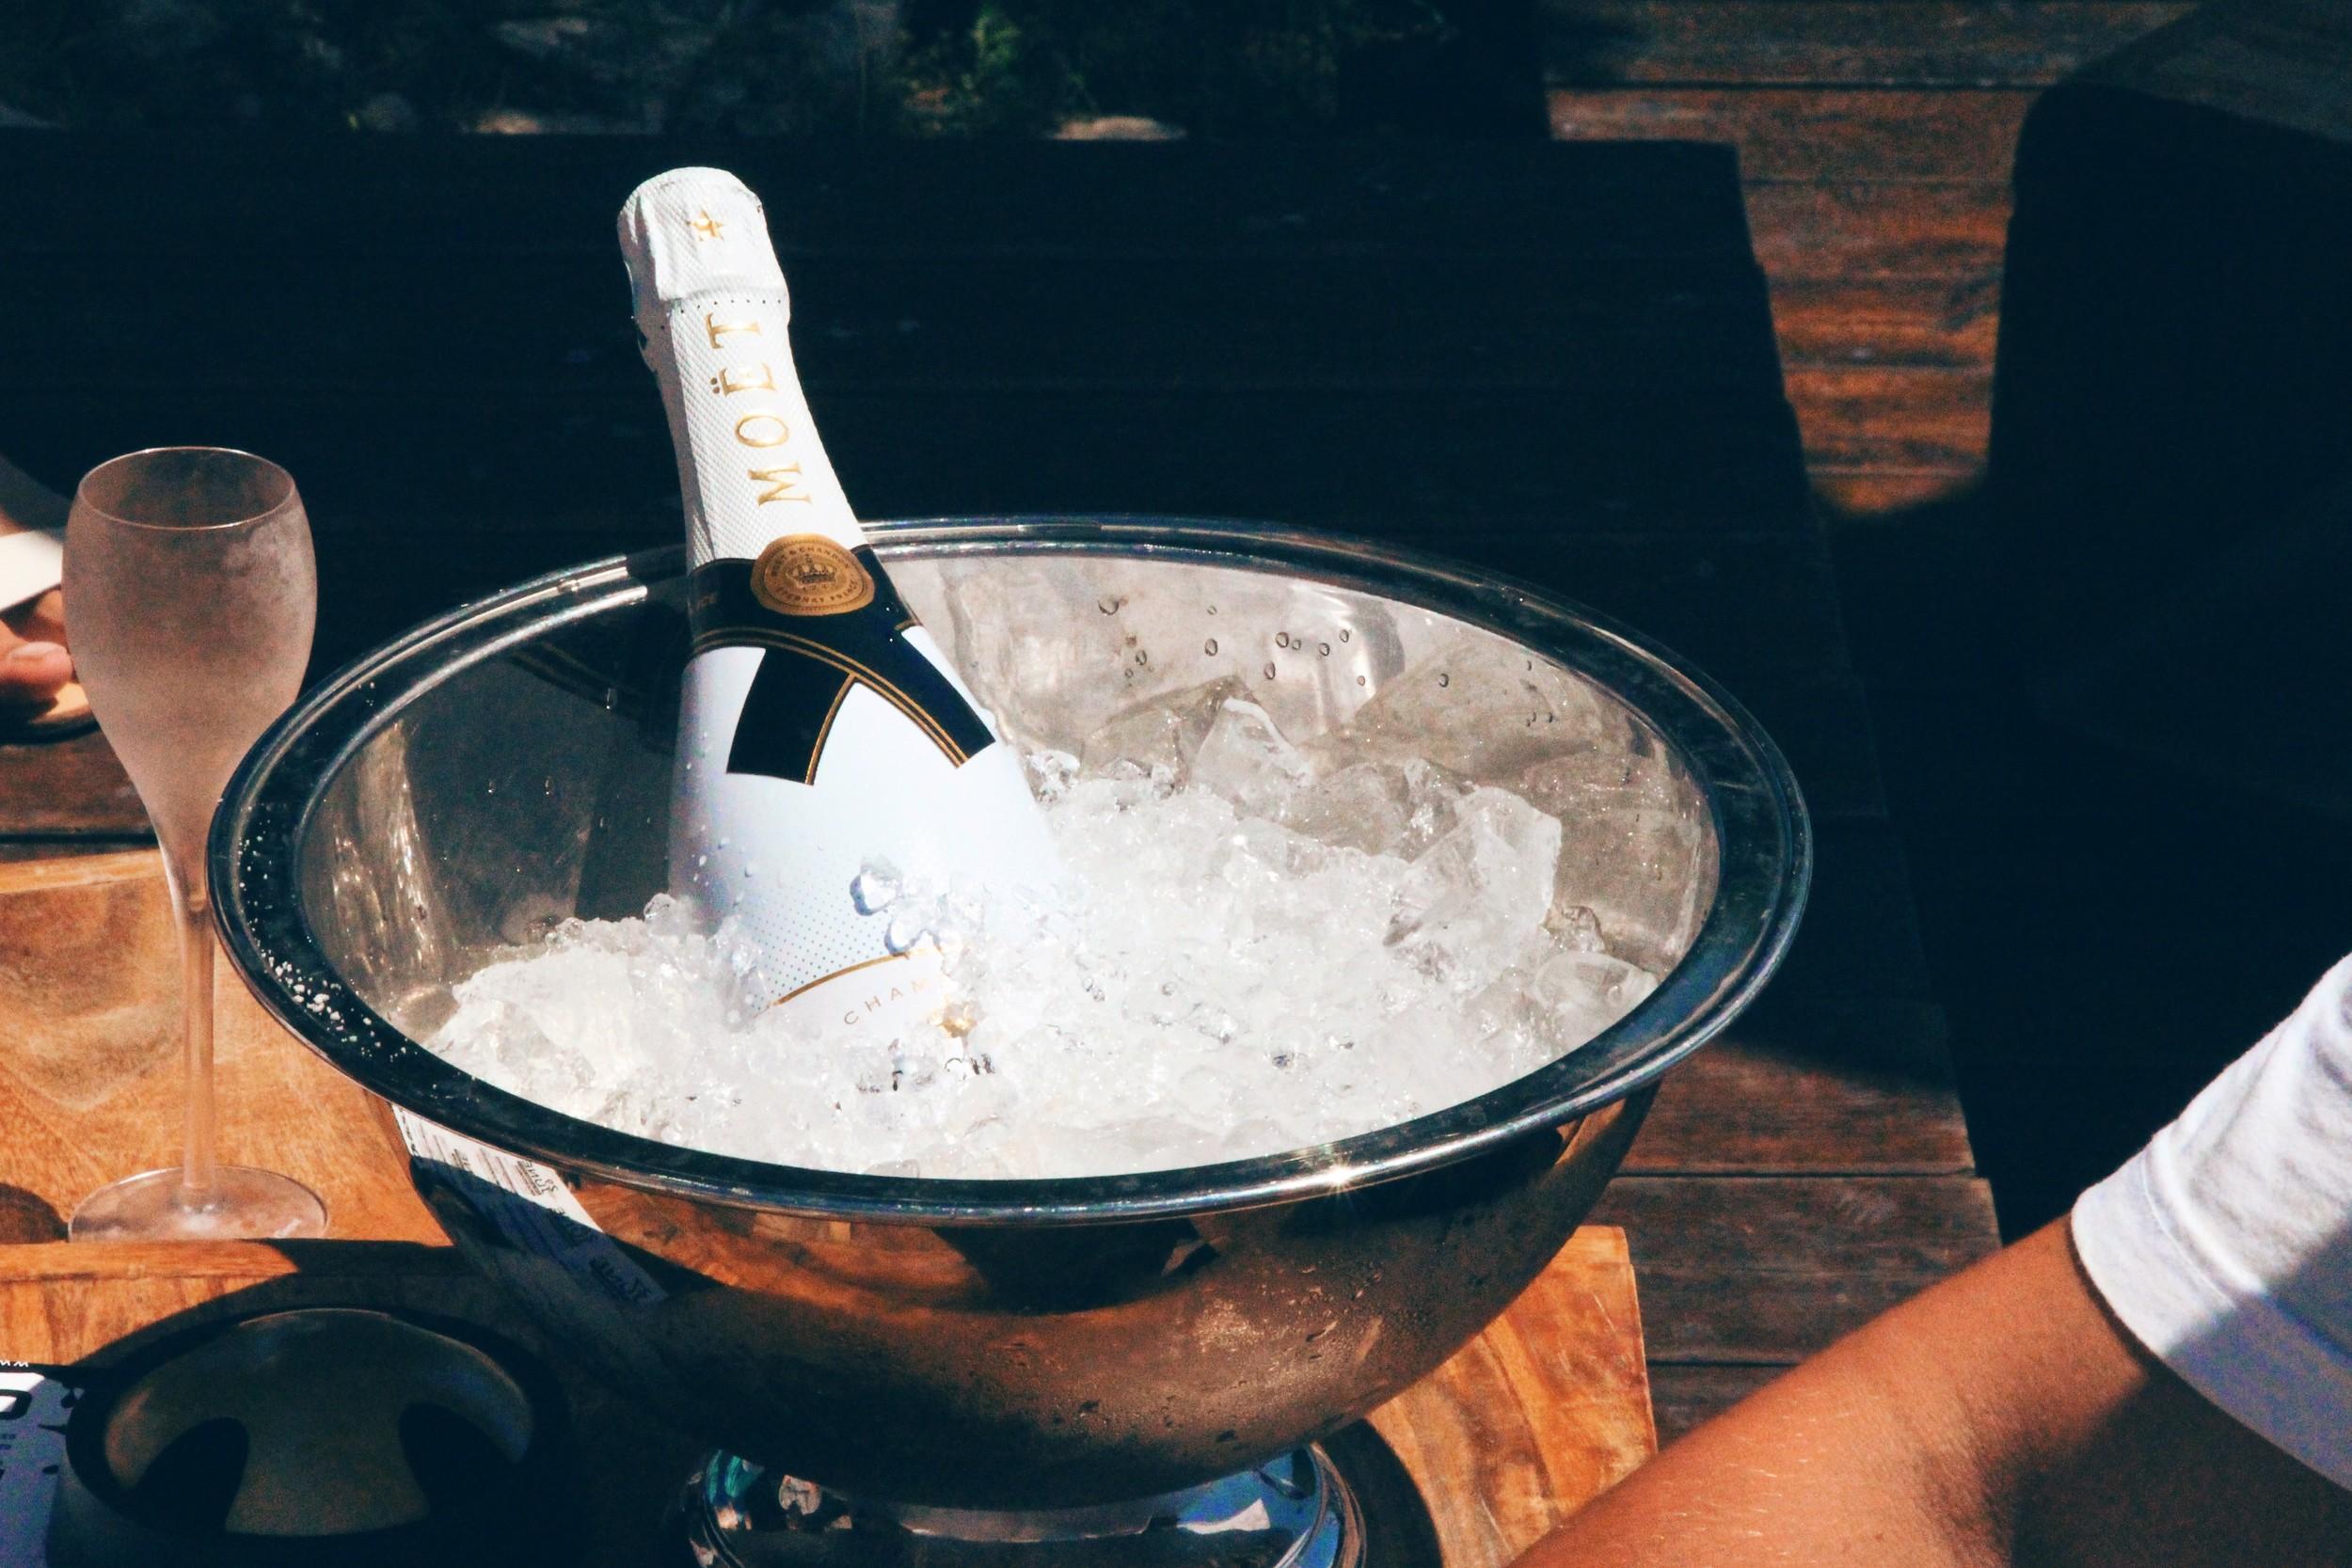 Champagne anyone?